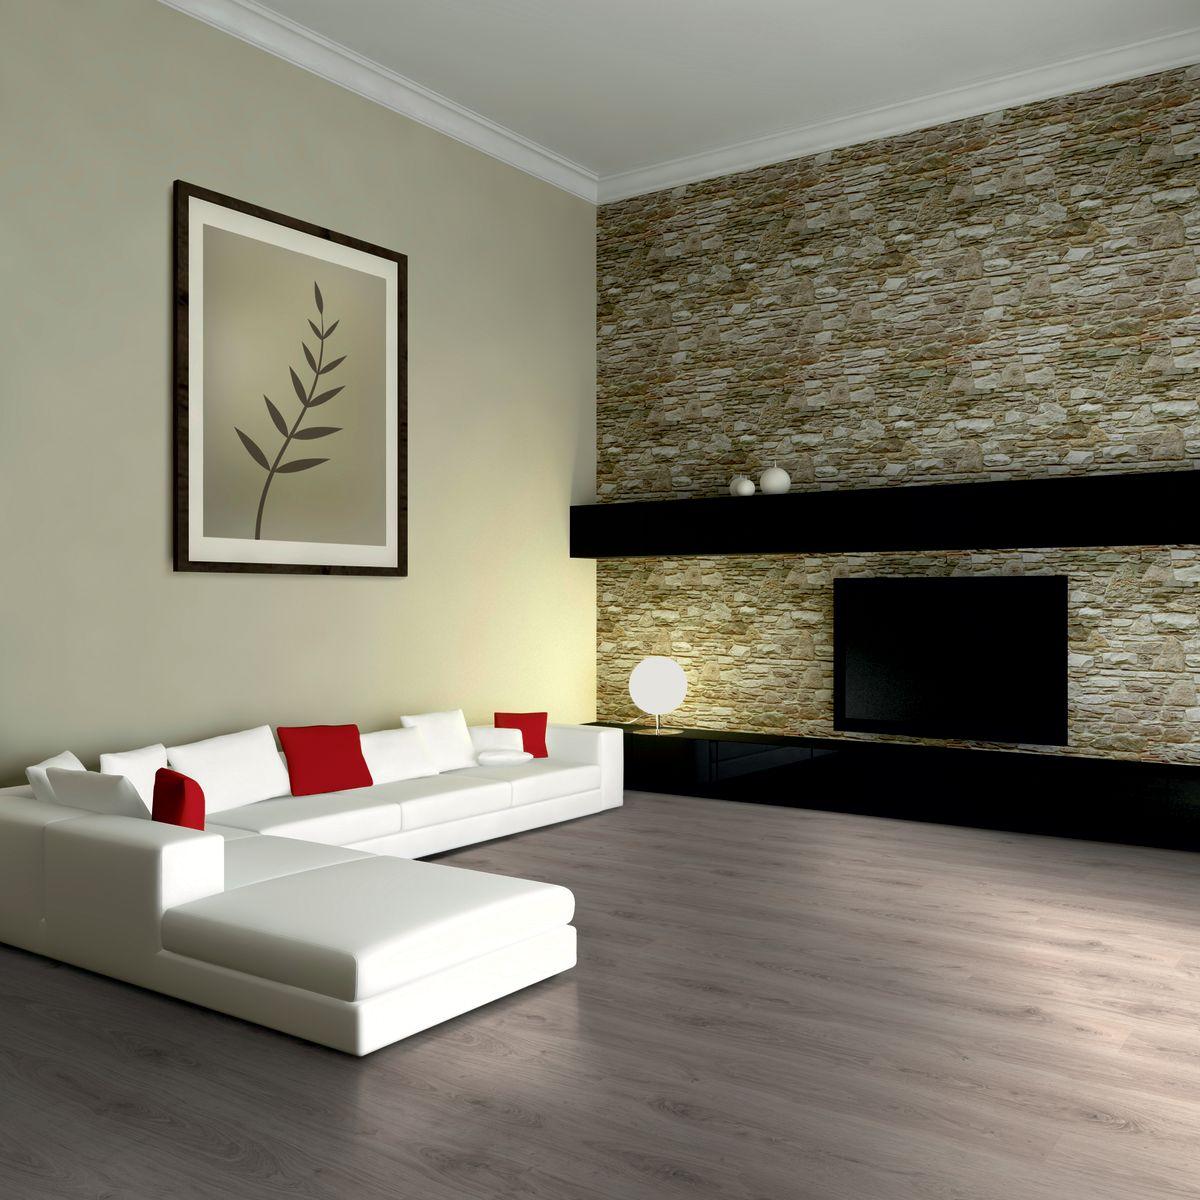 Finto parquet bianco gres effetto legno treverkmood for Finto parquet leroy merlin